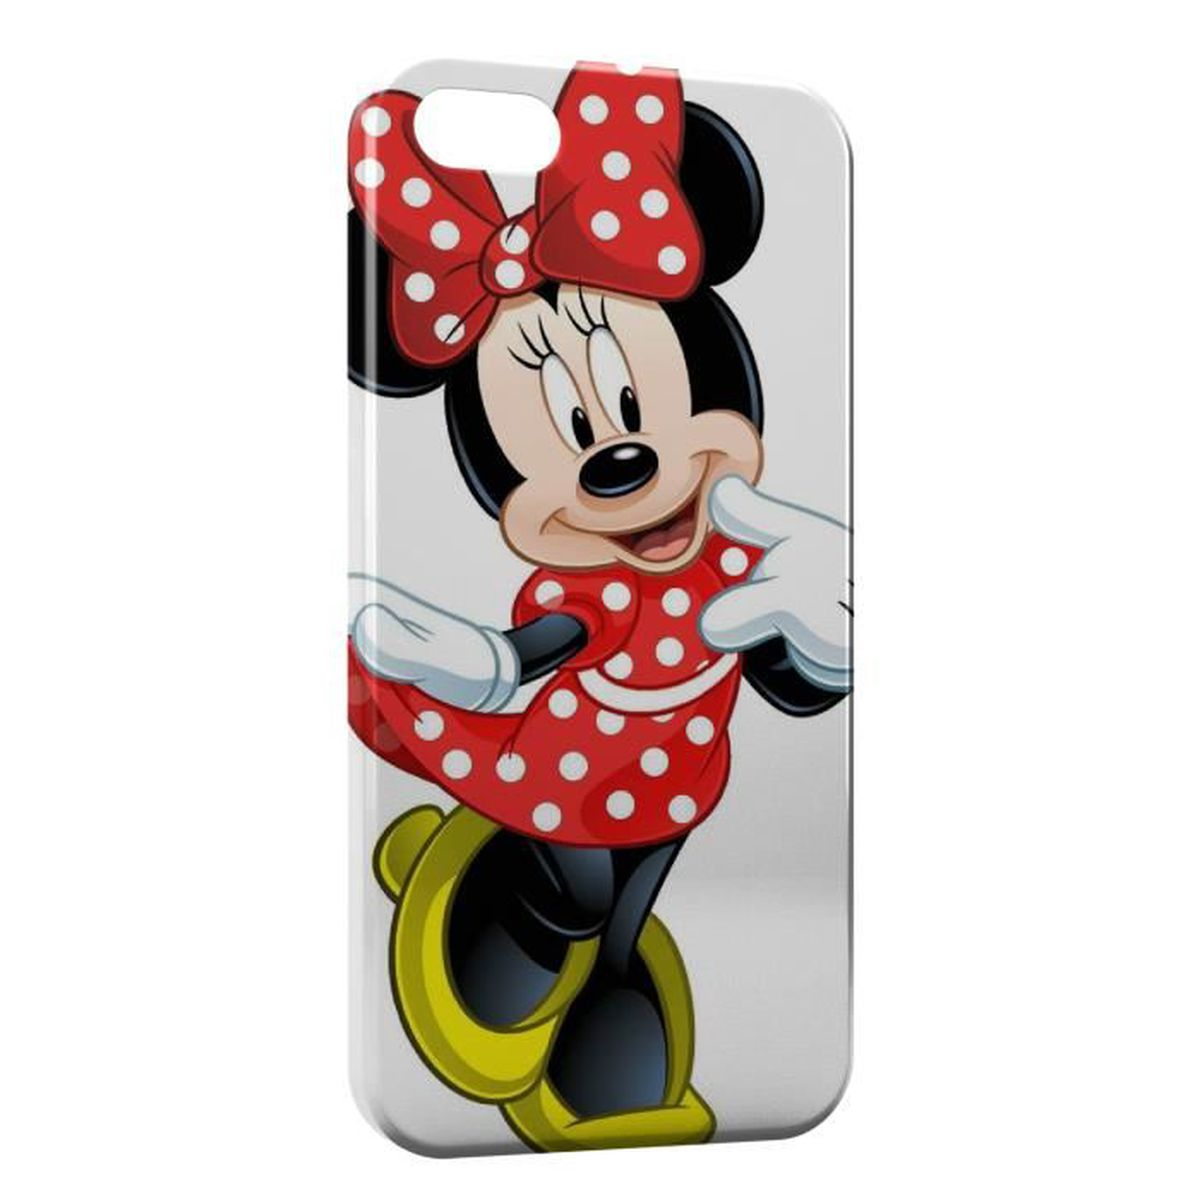 coque iphone 7 minnie mickey 4